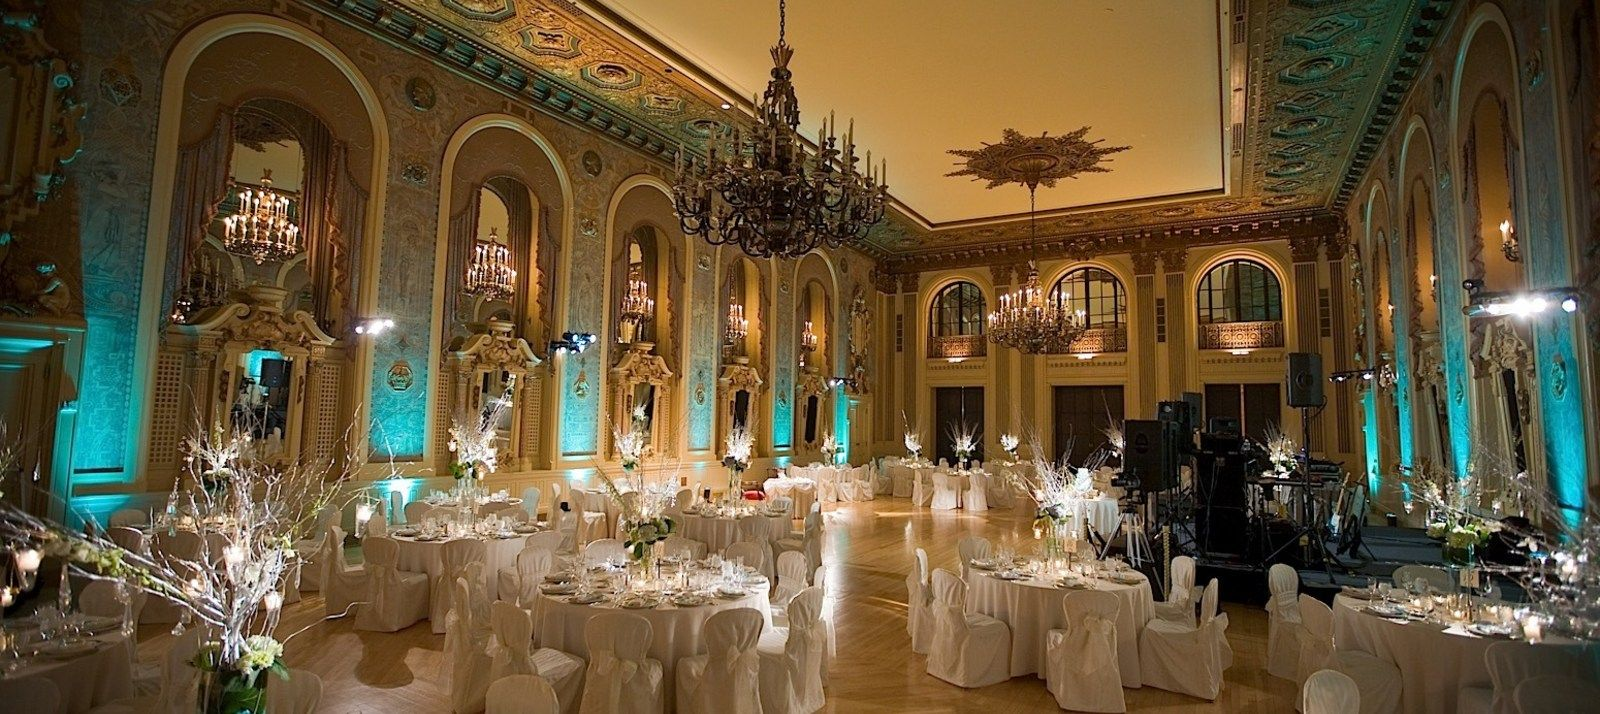 Wedding Venues In Wilmington Delaware Hotel Du Pont Wedding Venues Delaware Wedding Venues Delaware Hotels